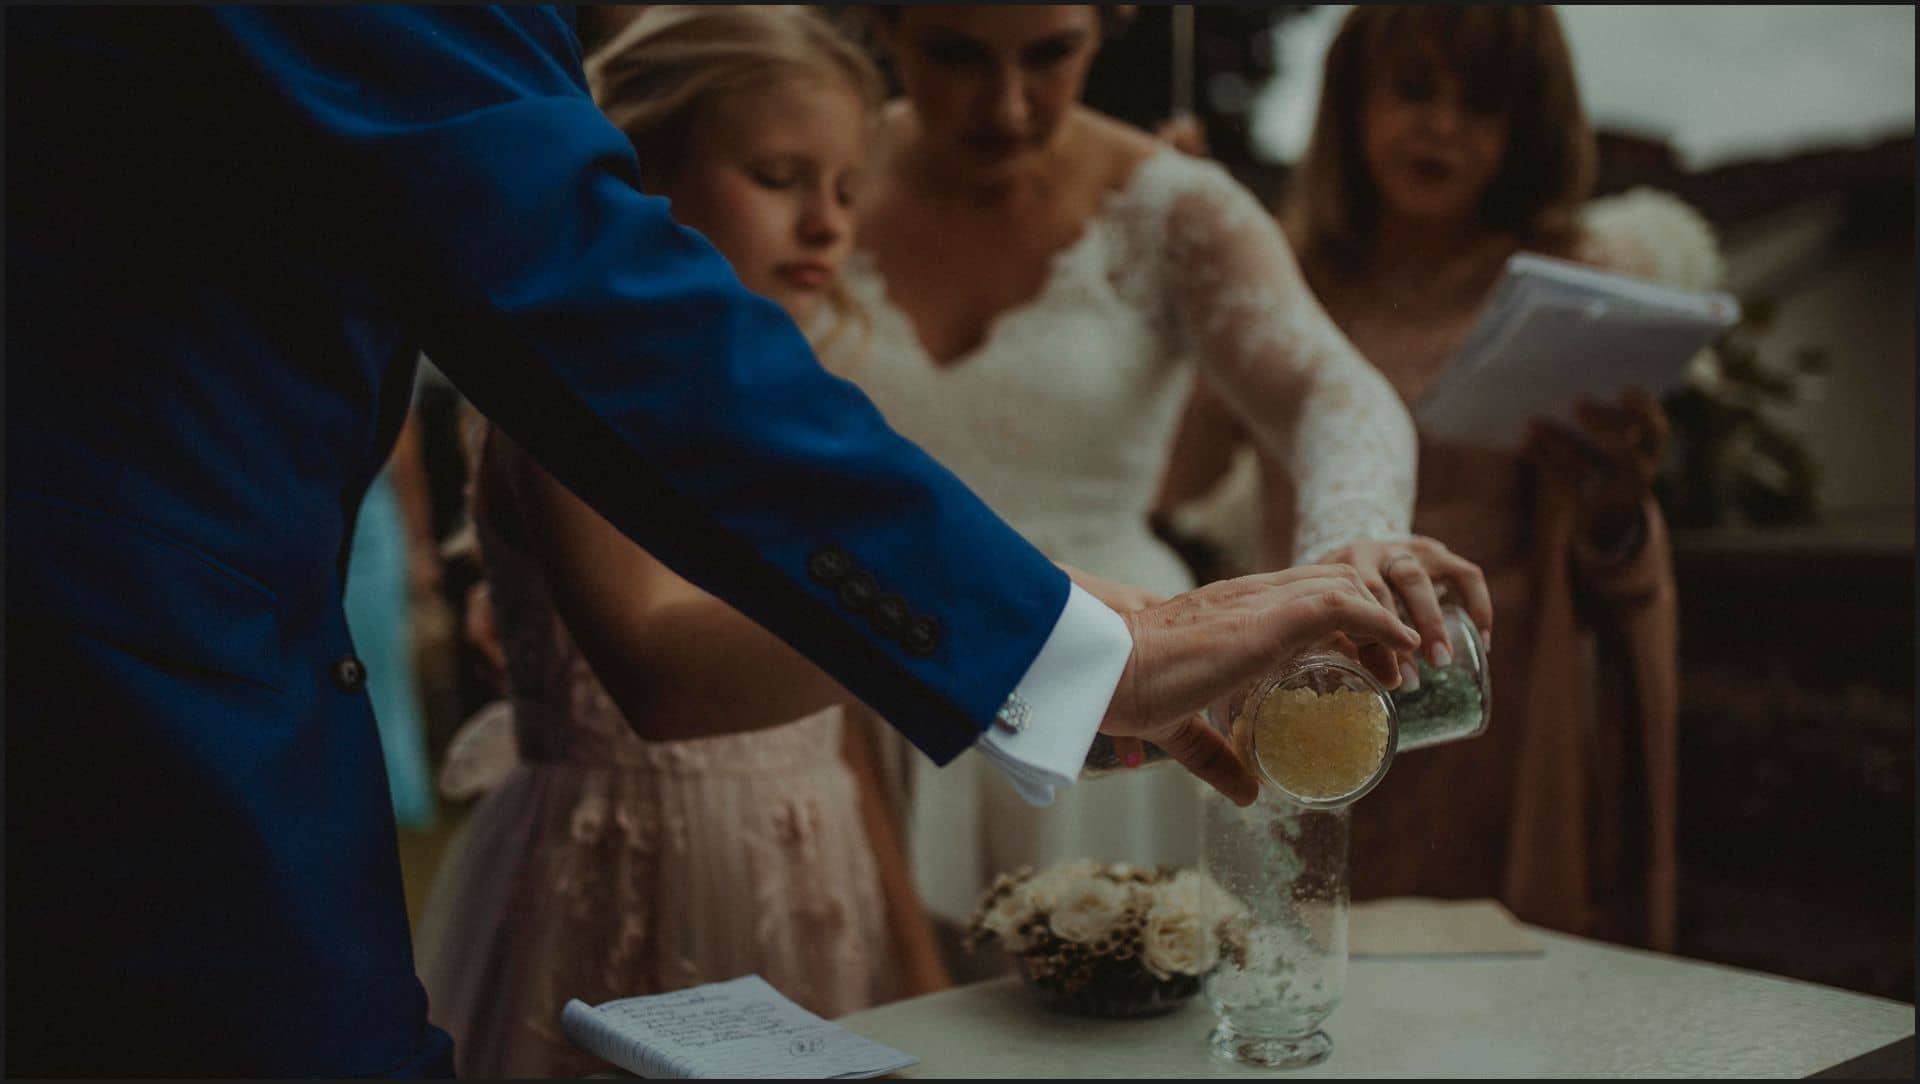 tuscany, destination wedding, chianti, wedding ceremony, bride, groom, symbolic